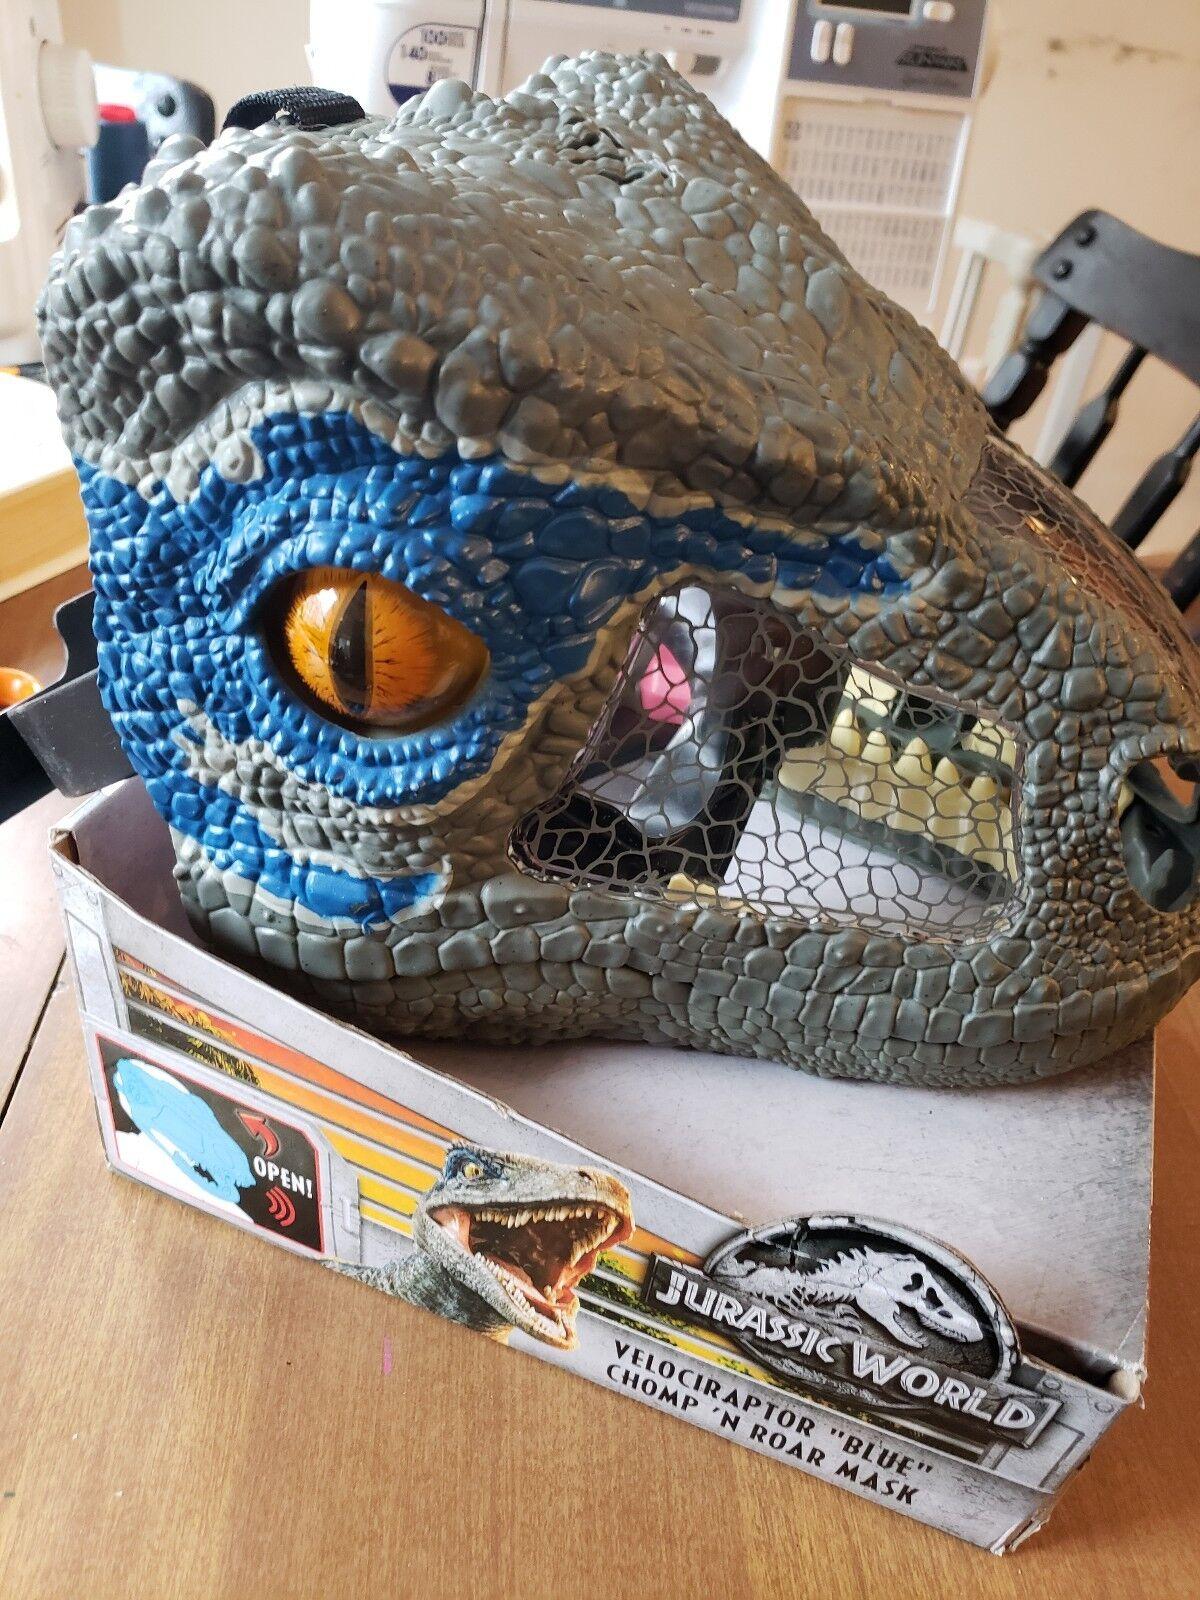 NIB Jurassic World bluee bluee bluee Chomp 'N Roar Velociraptor Mask Dinosaur new Toy 504422